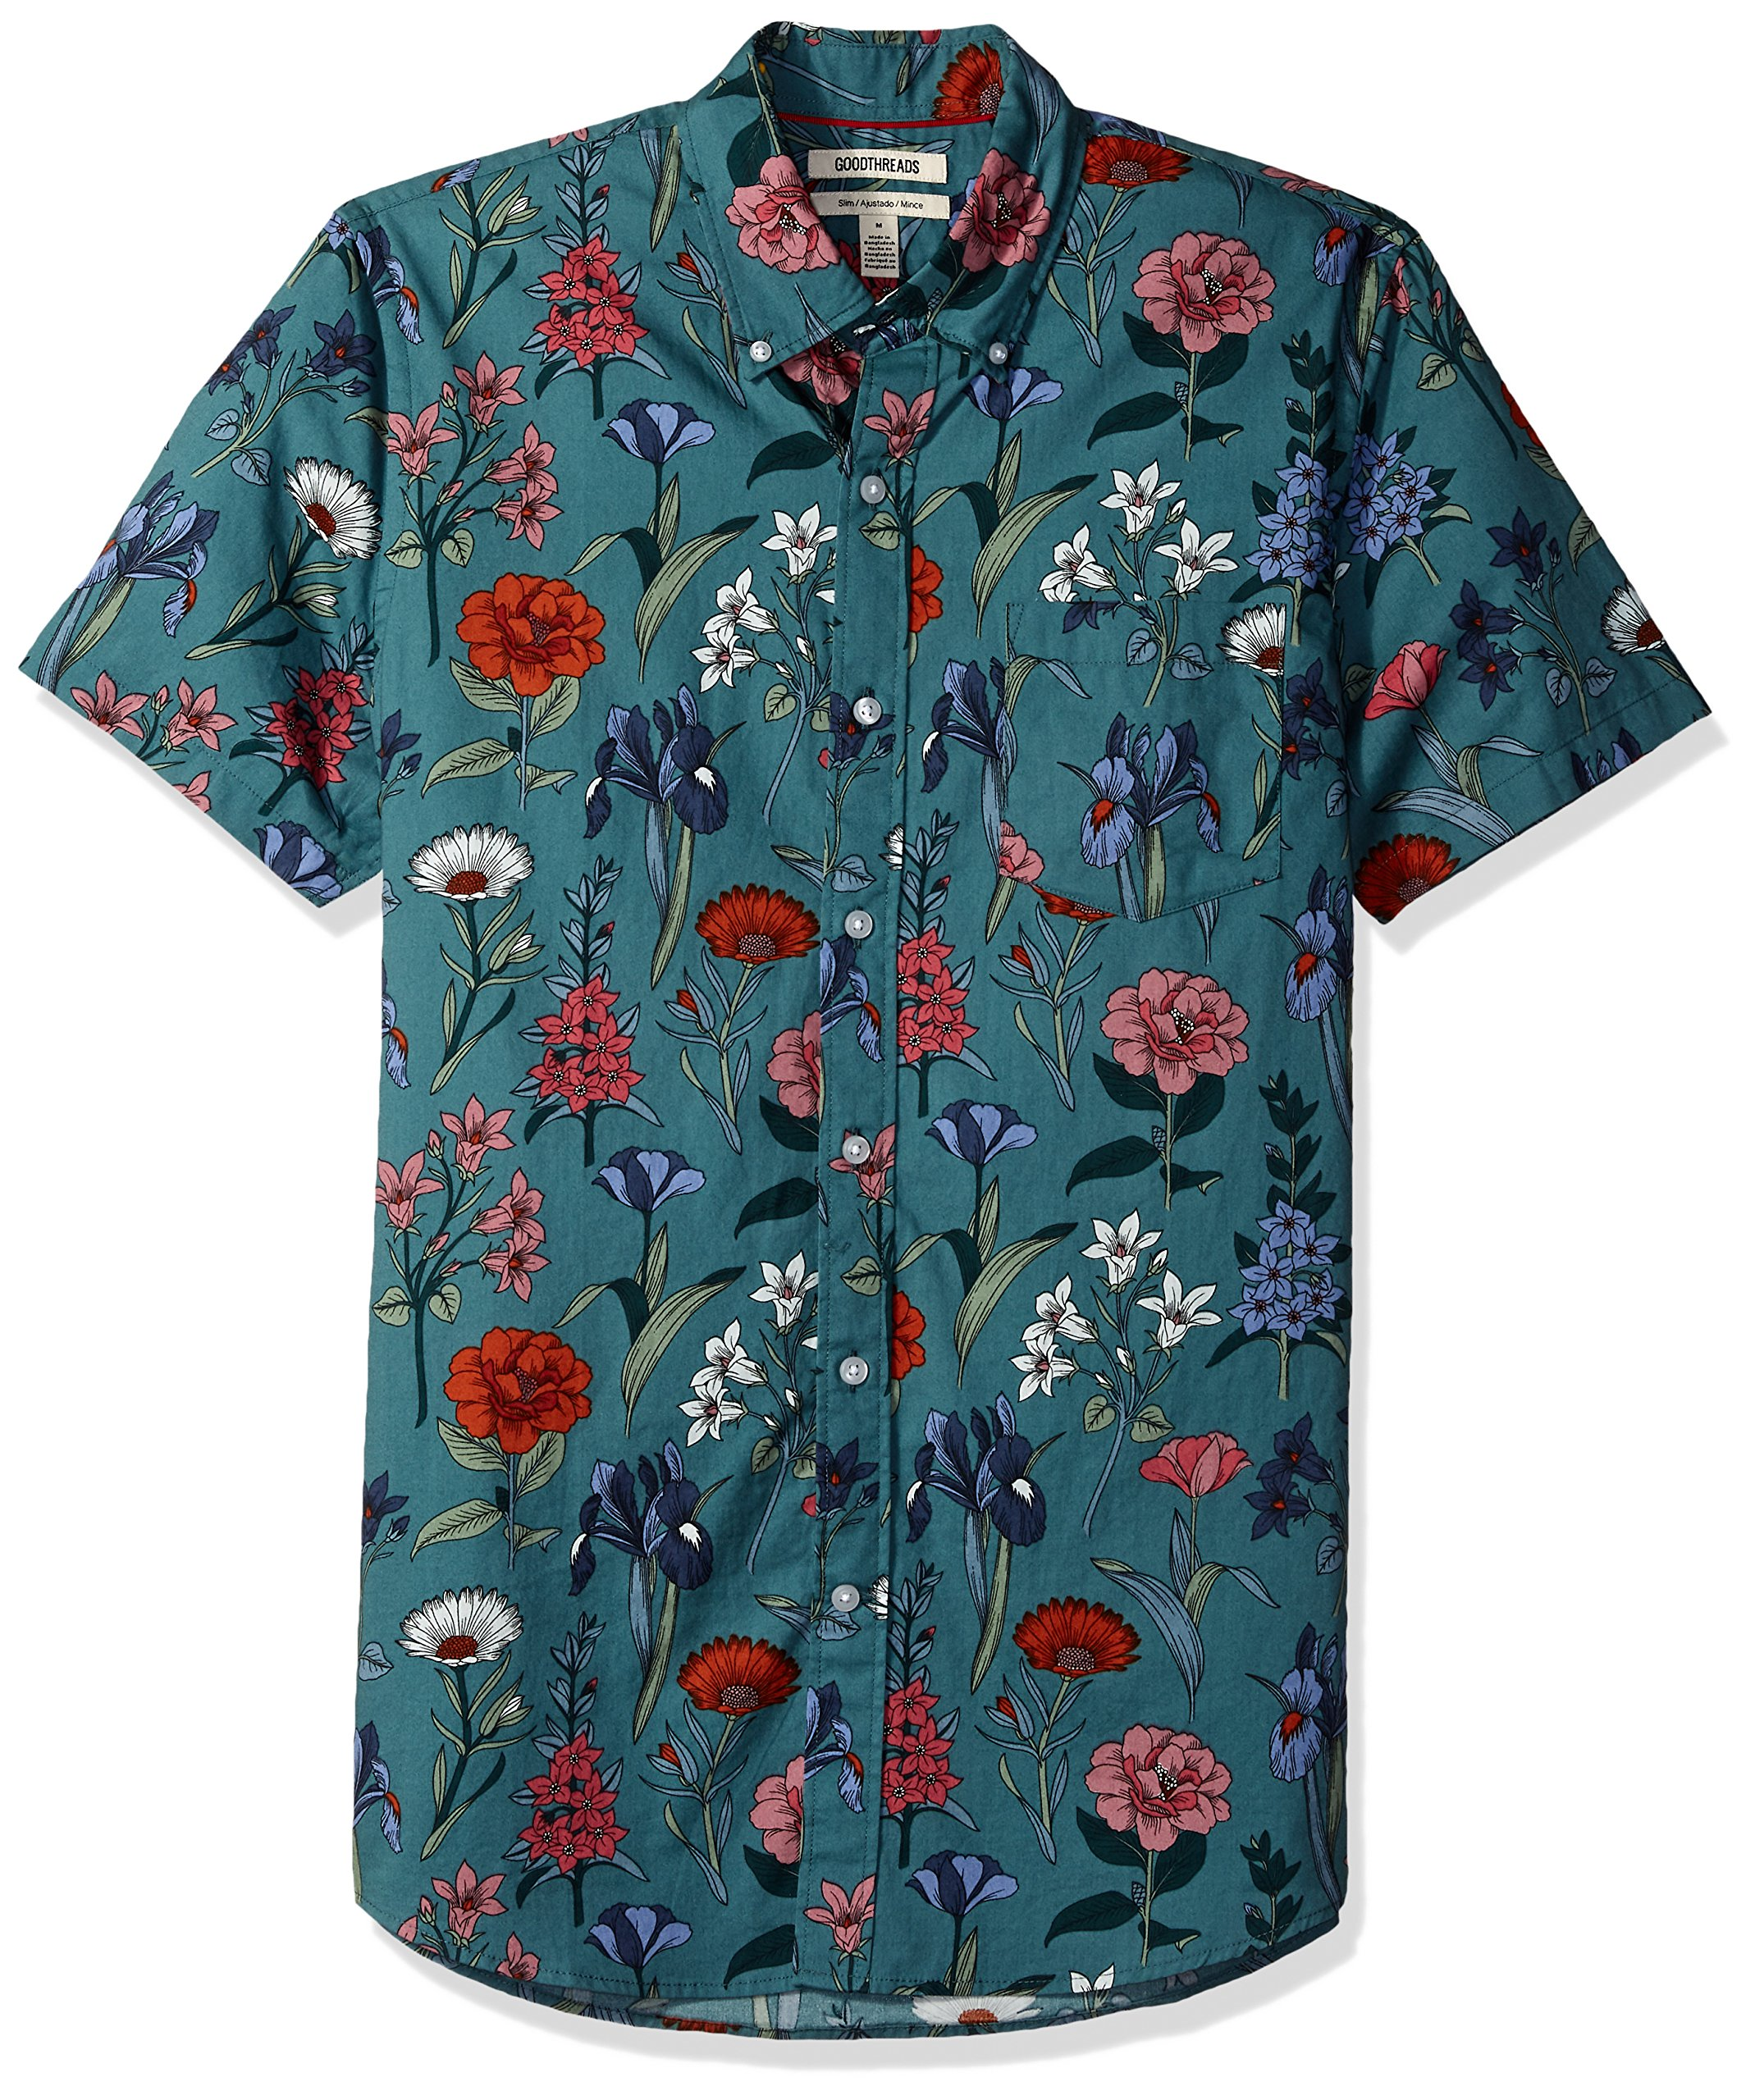 Goodthreads Men's Slim-Fit Short-Sleeve Printed Shirt, Wallpaper Floral, Large by Goodthreads